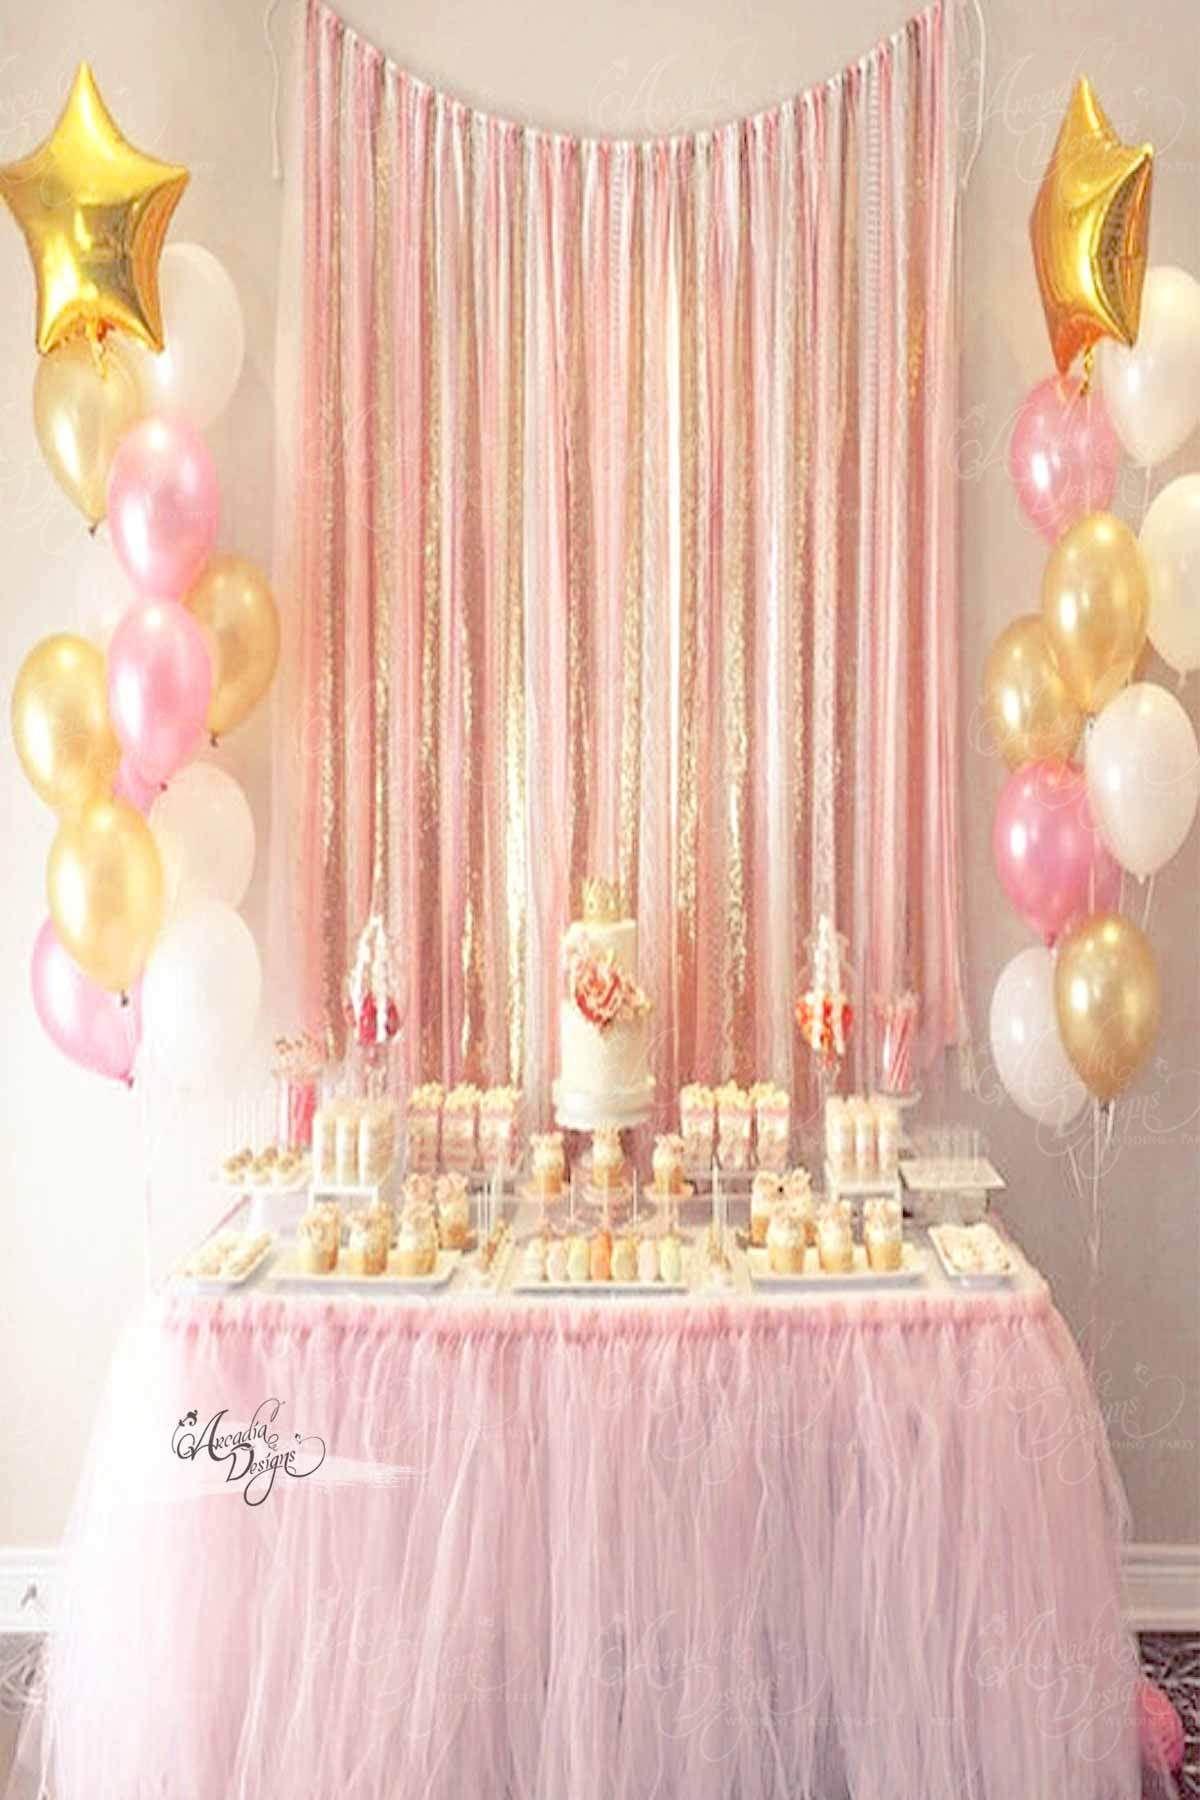 Blush Pink Gold Tassel Backdrop Pink Gold Birthday Party Gold Birthday Party Birthday Table